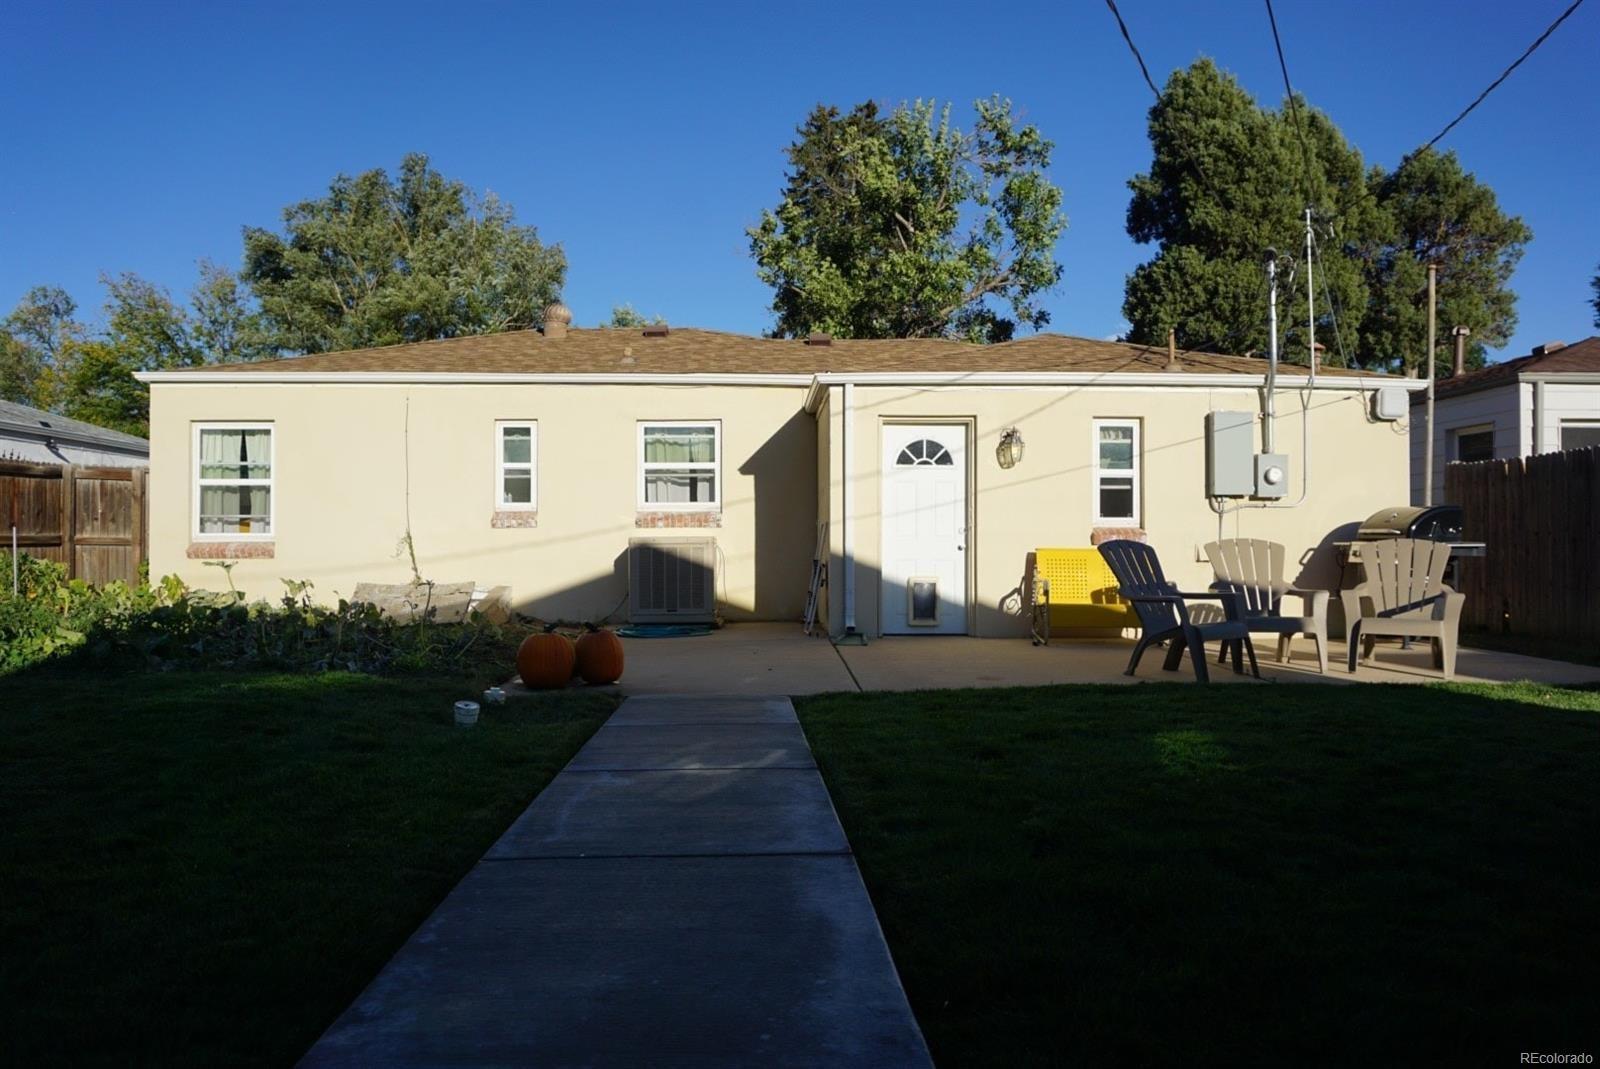 MLS# 9559127 - 2 - 4389 S Sherman Street, Englewood, CO 80113